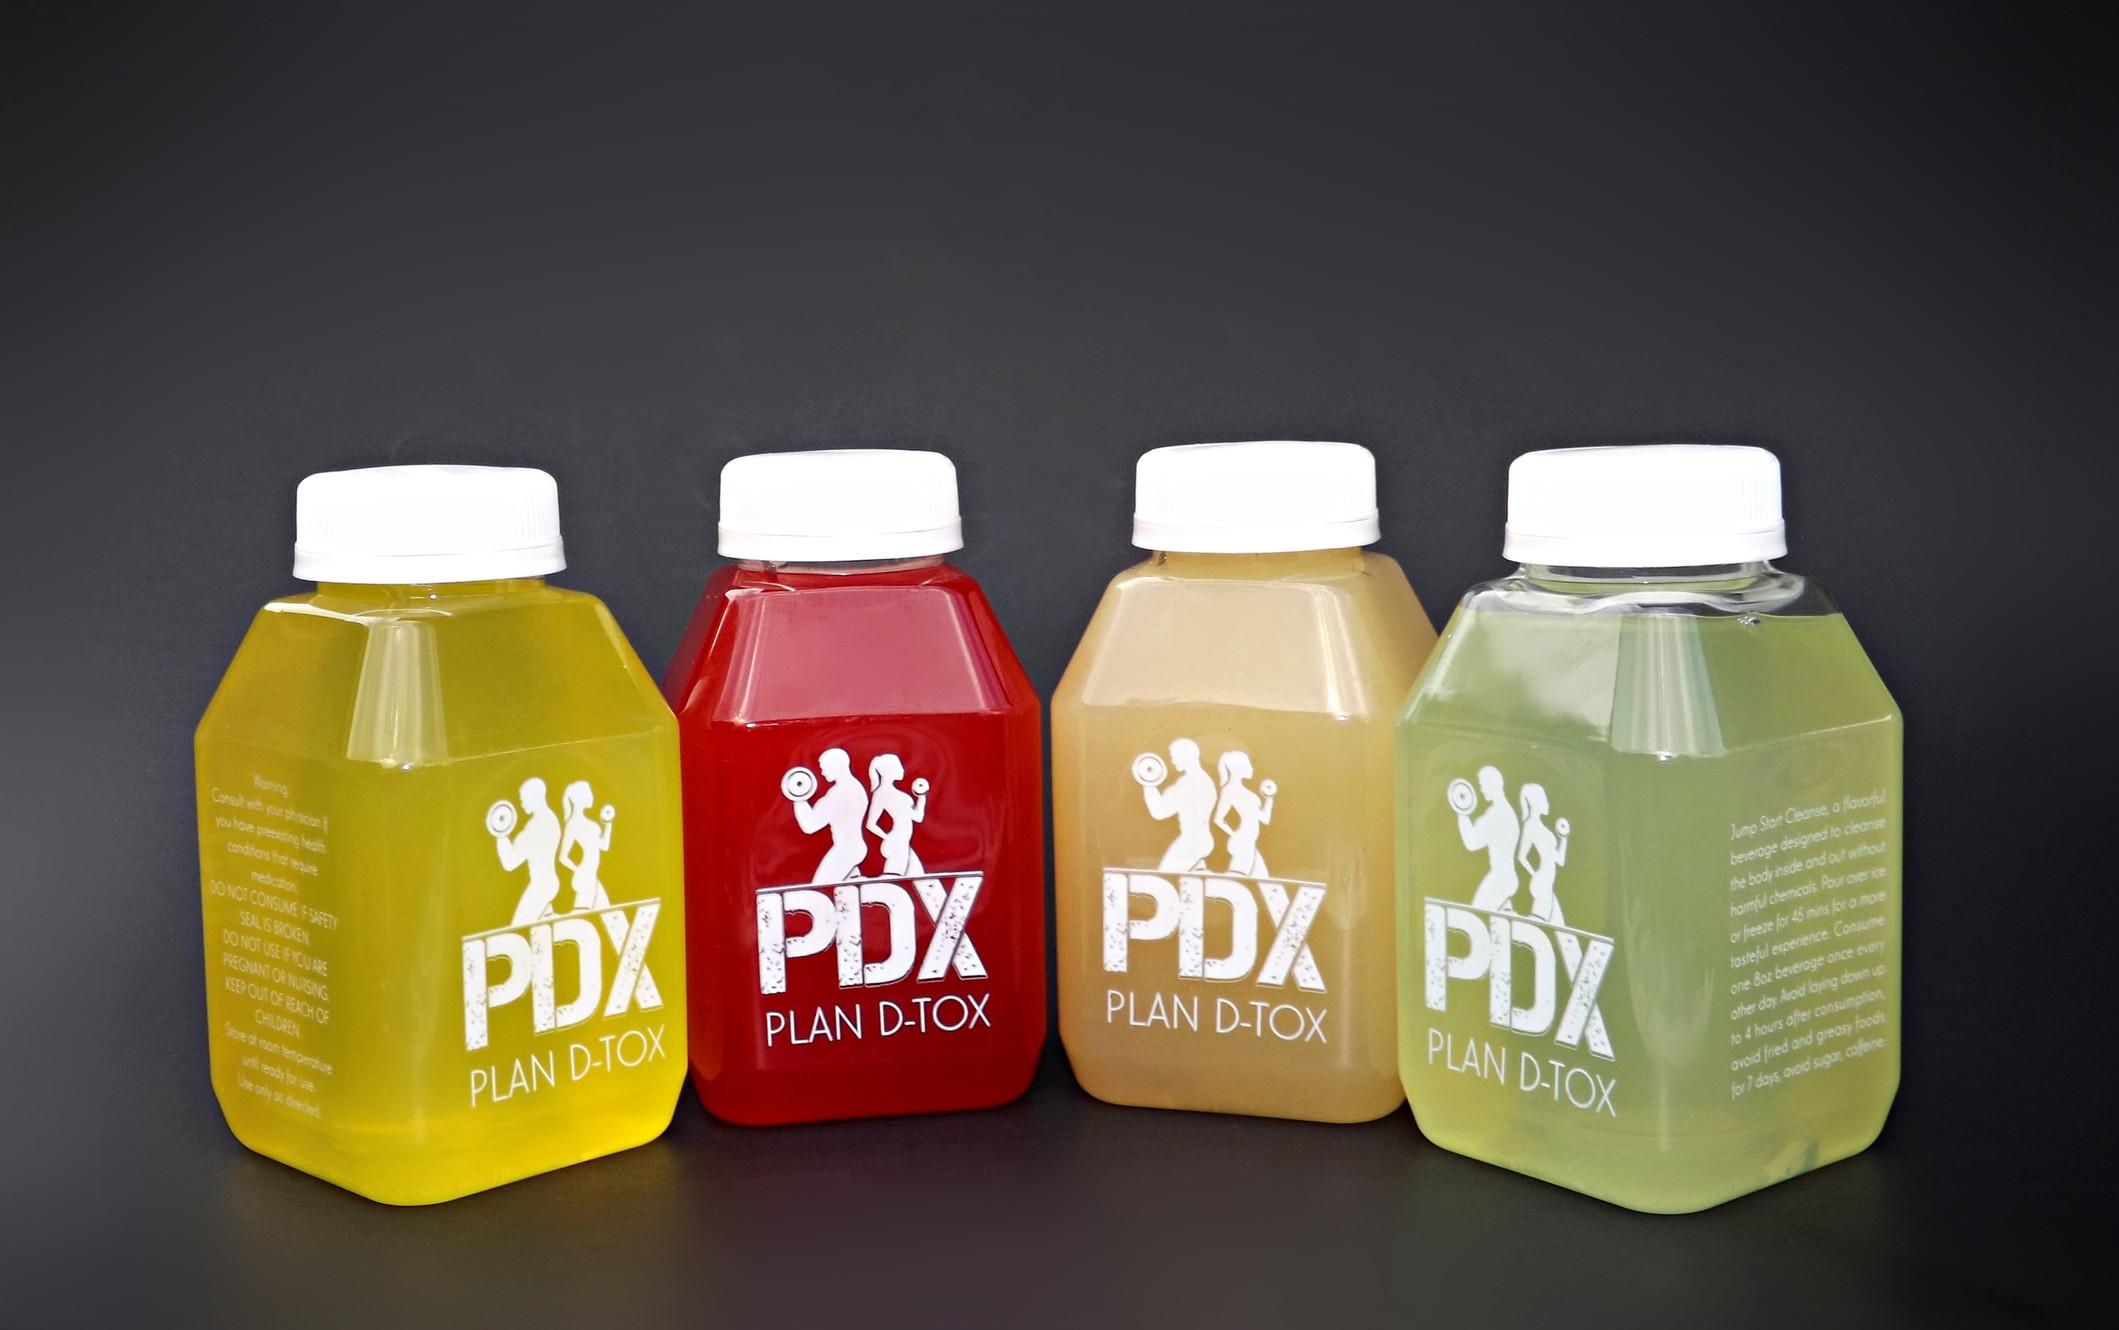 max detox pdx)